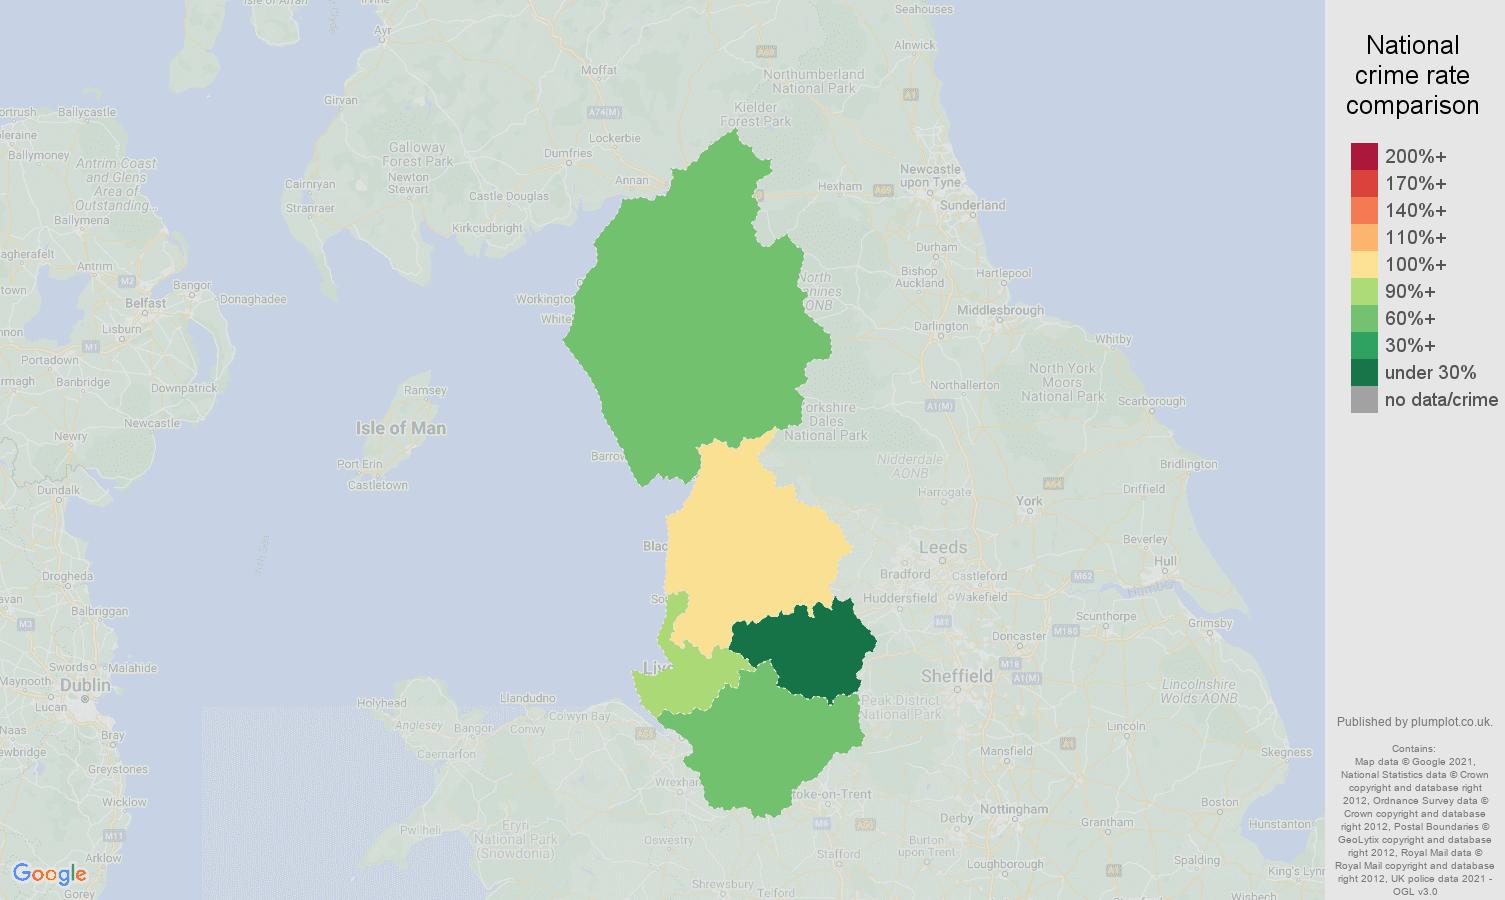 North West burglary crime rate comparison map